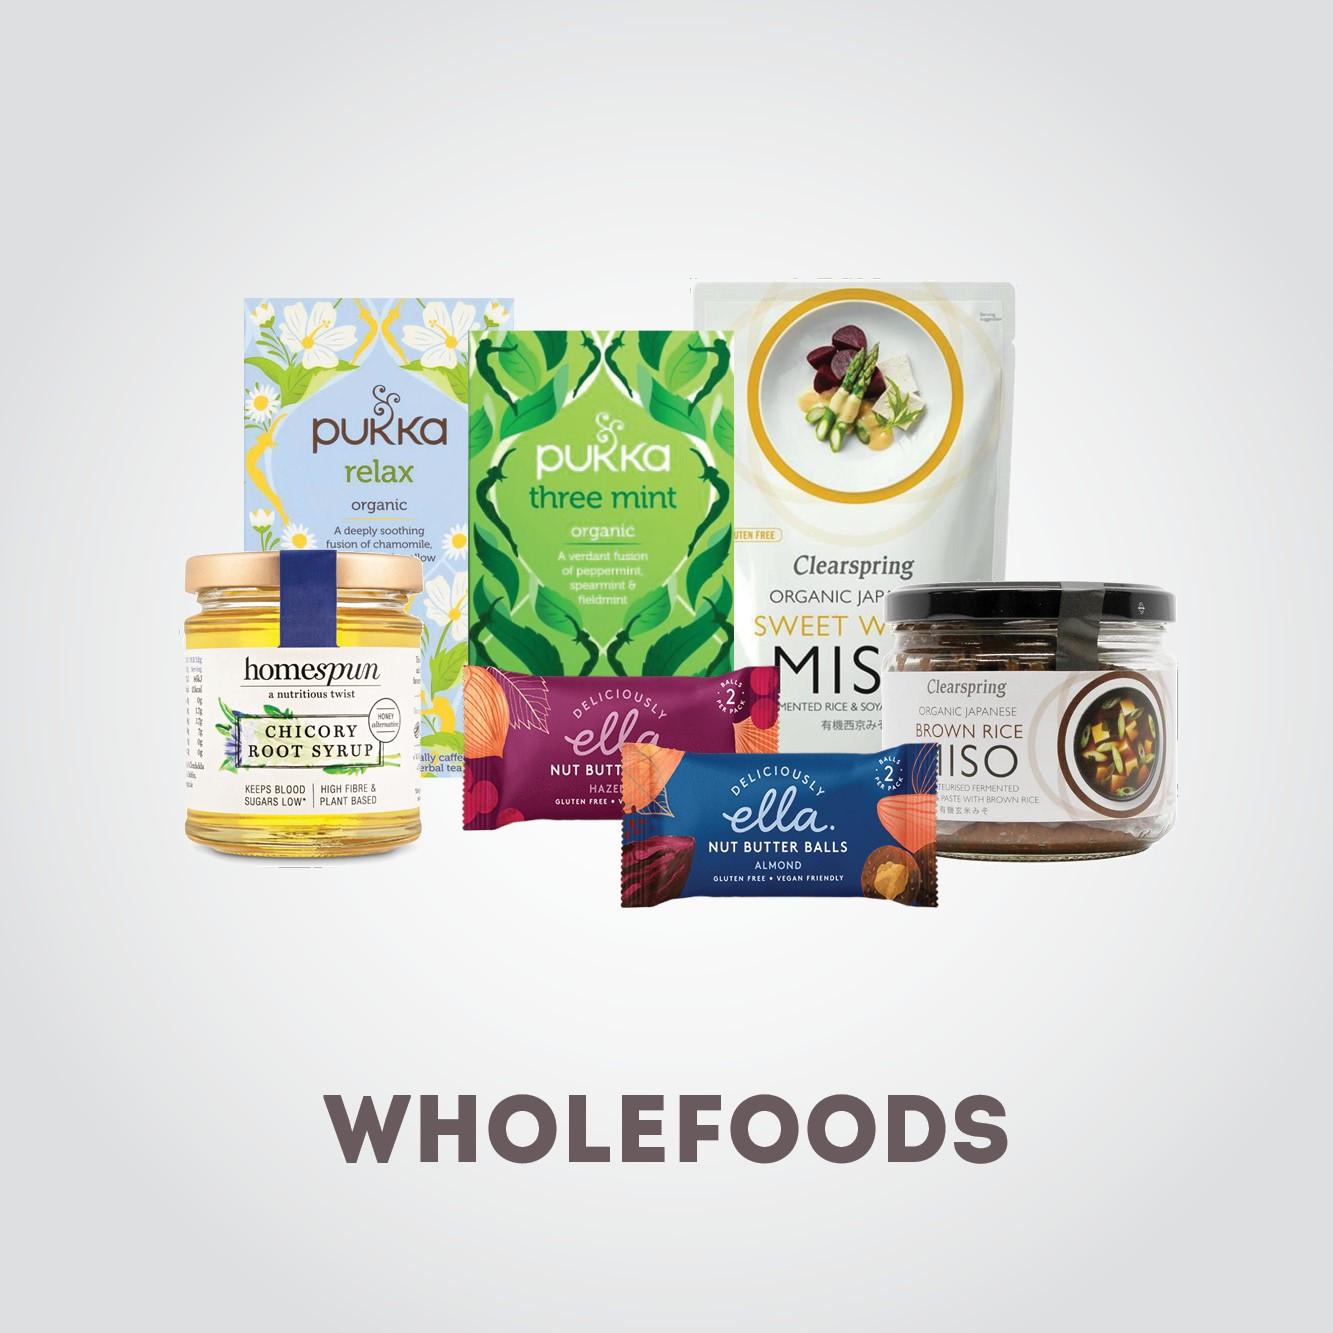 Nourish Wholefoods Go Vegan Powered by Plants